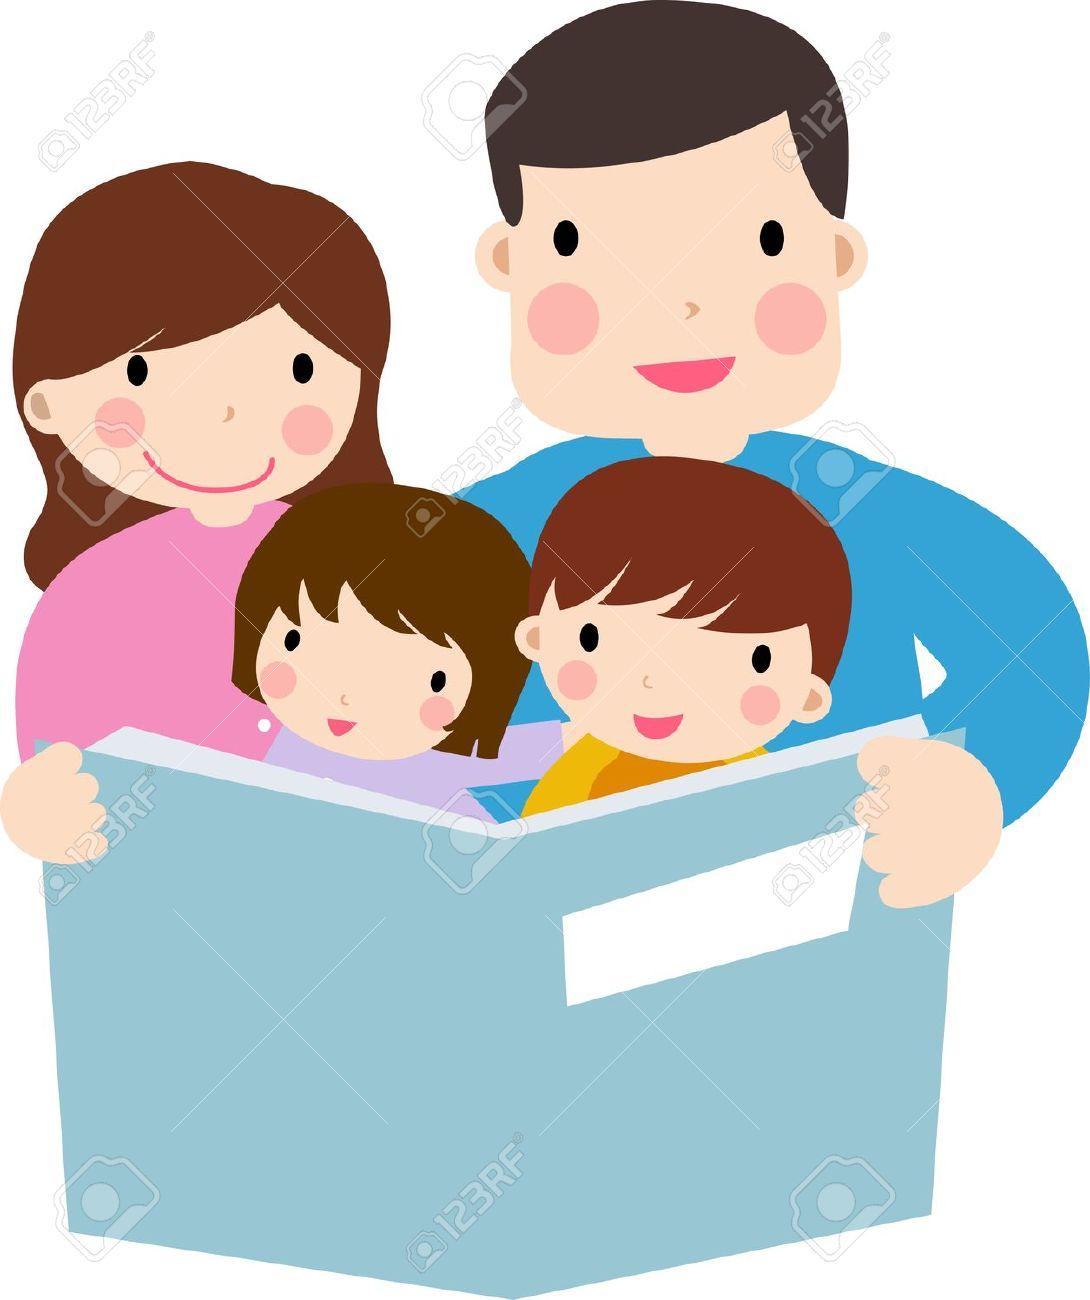 Clip Art Of Child With Parent-Clip art of child with parent-3